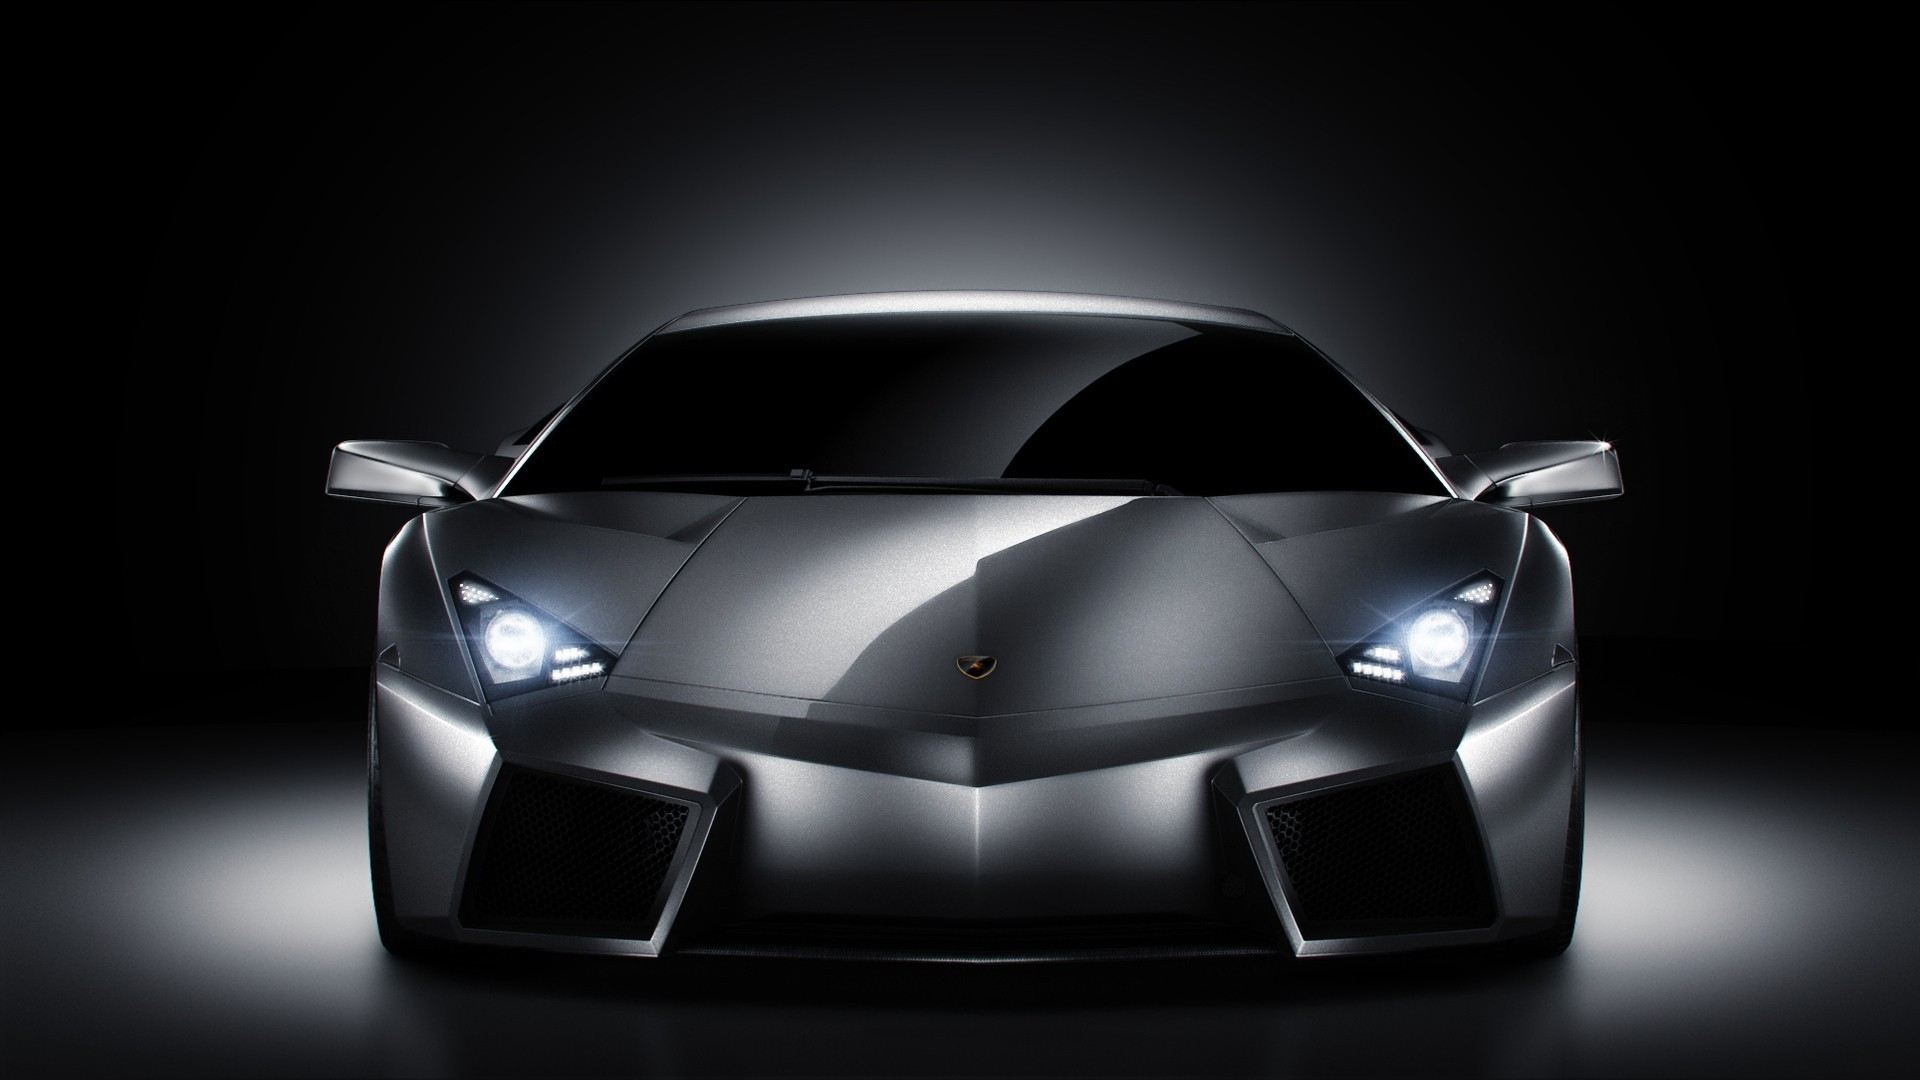 Lamborghini Reventon Hd Wallpaper 4975 Hd Wallpapers in Cars .